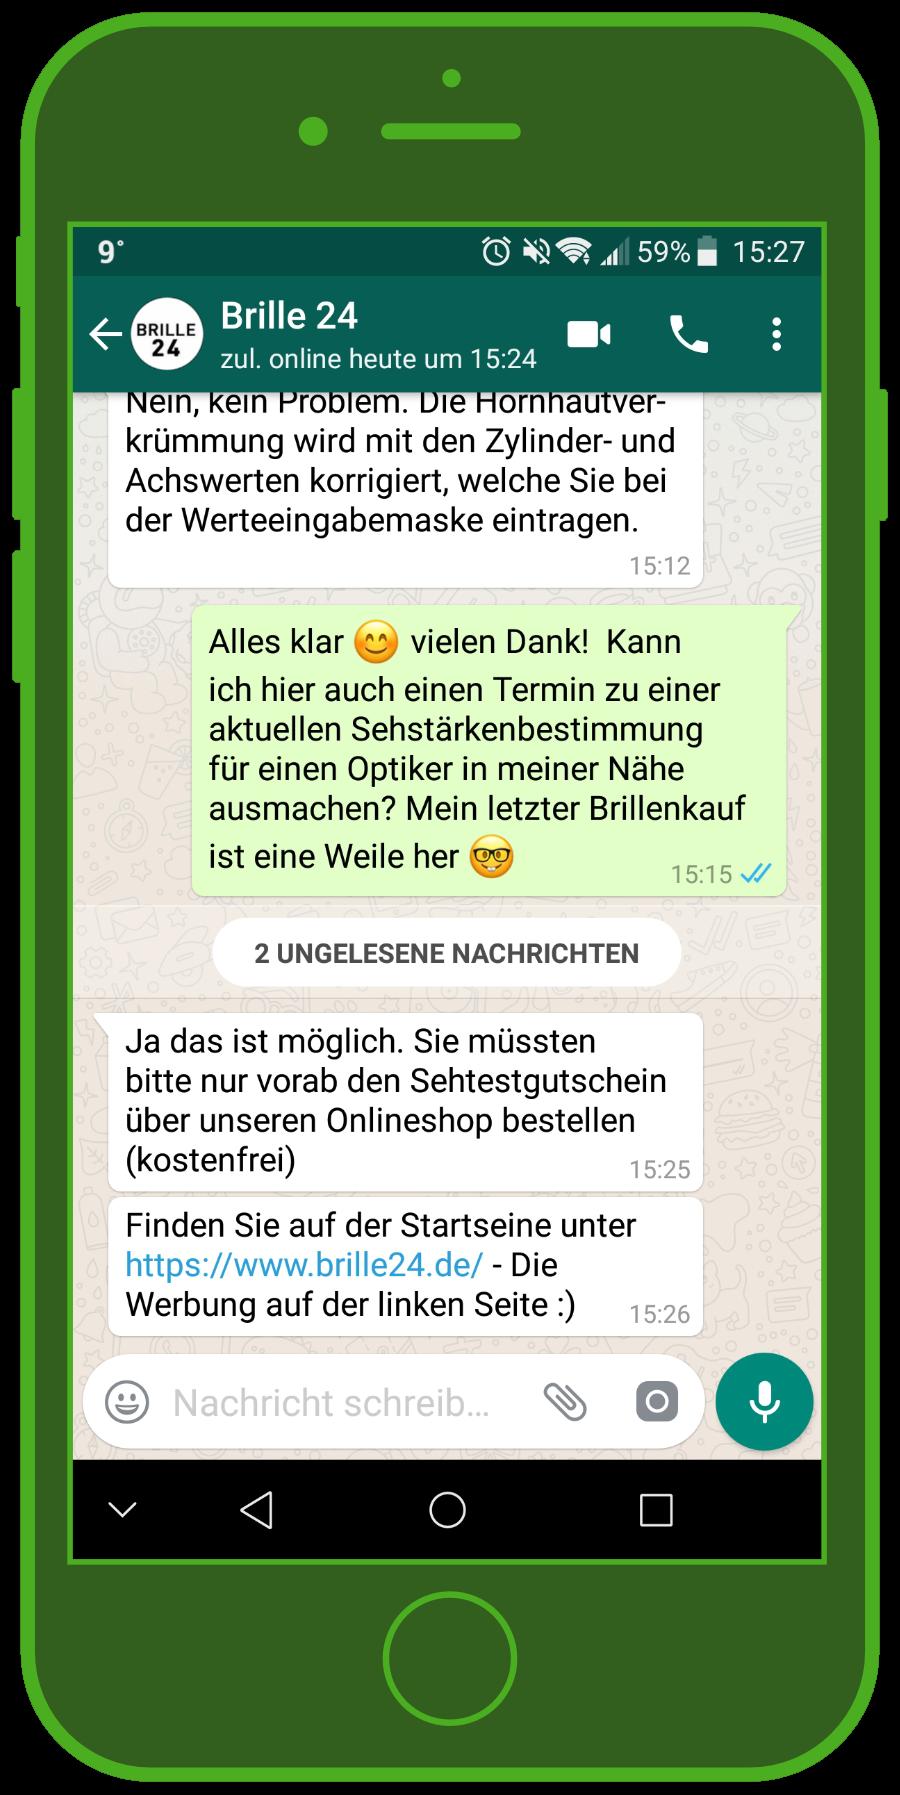 device-brille24-chat-2-whatsapp-e-commerce